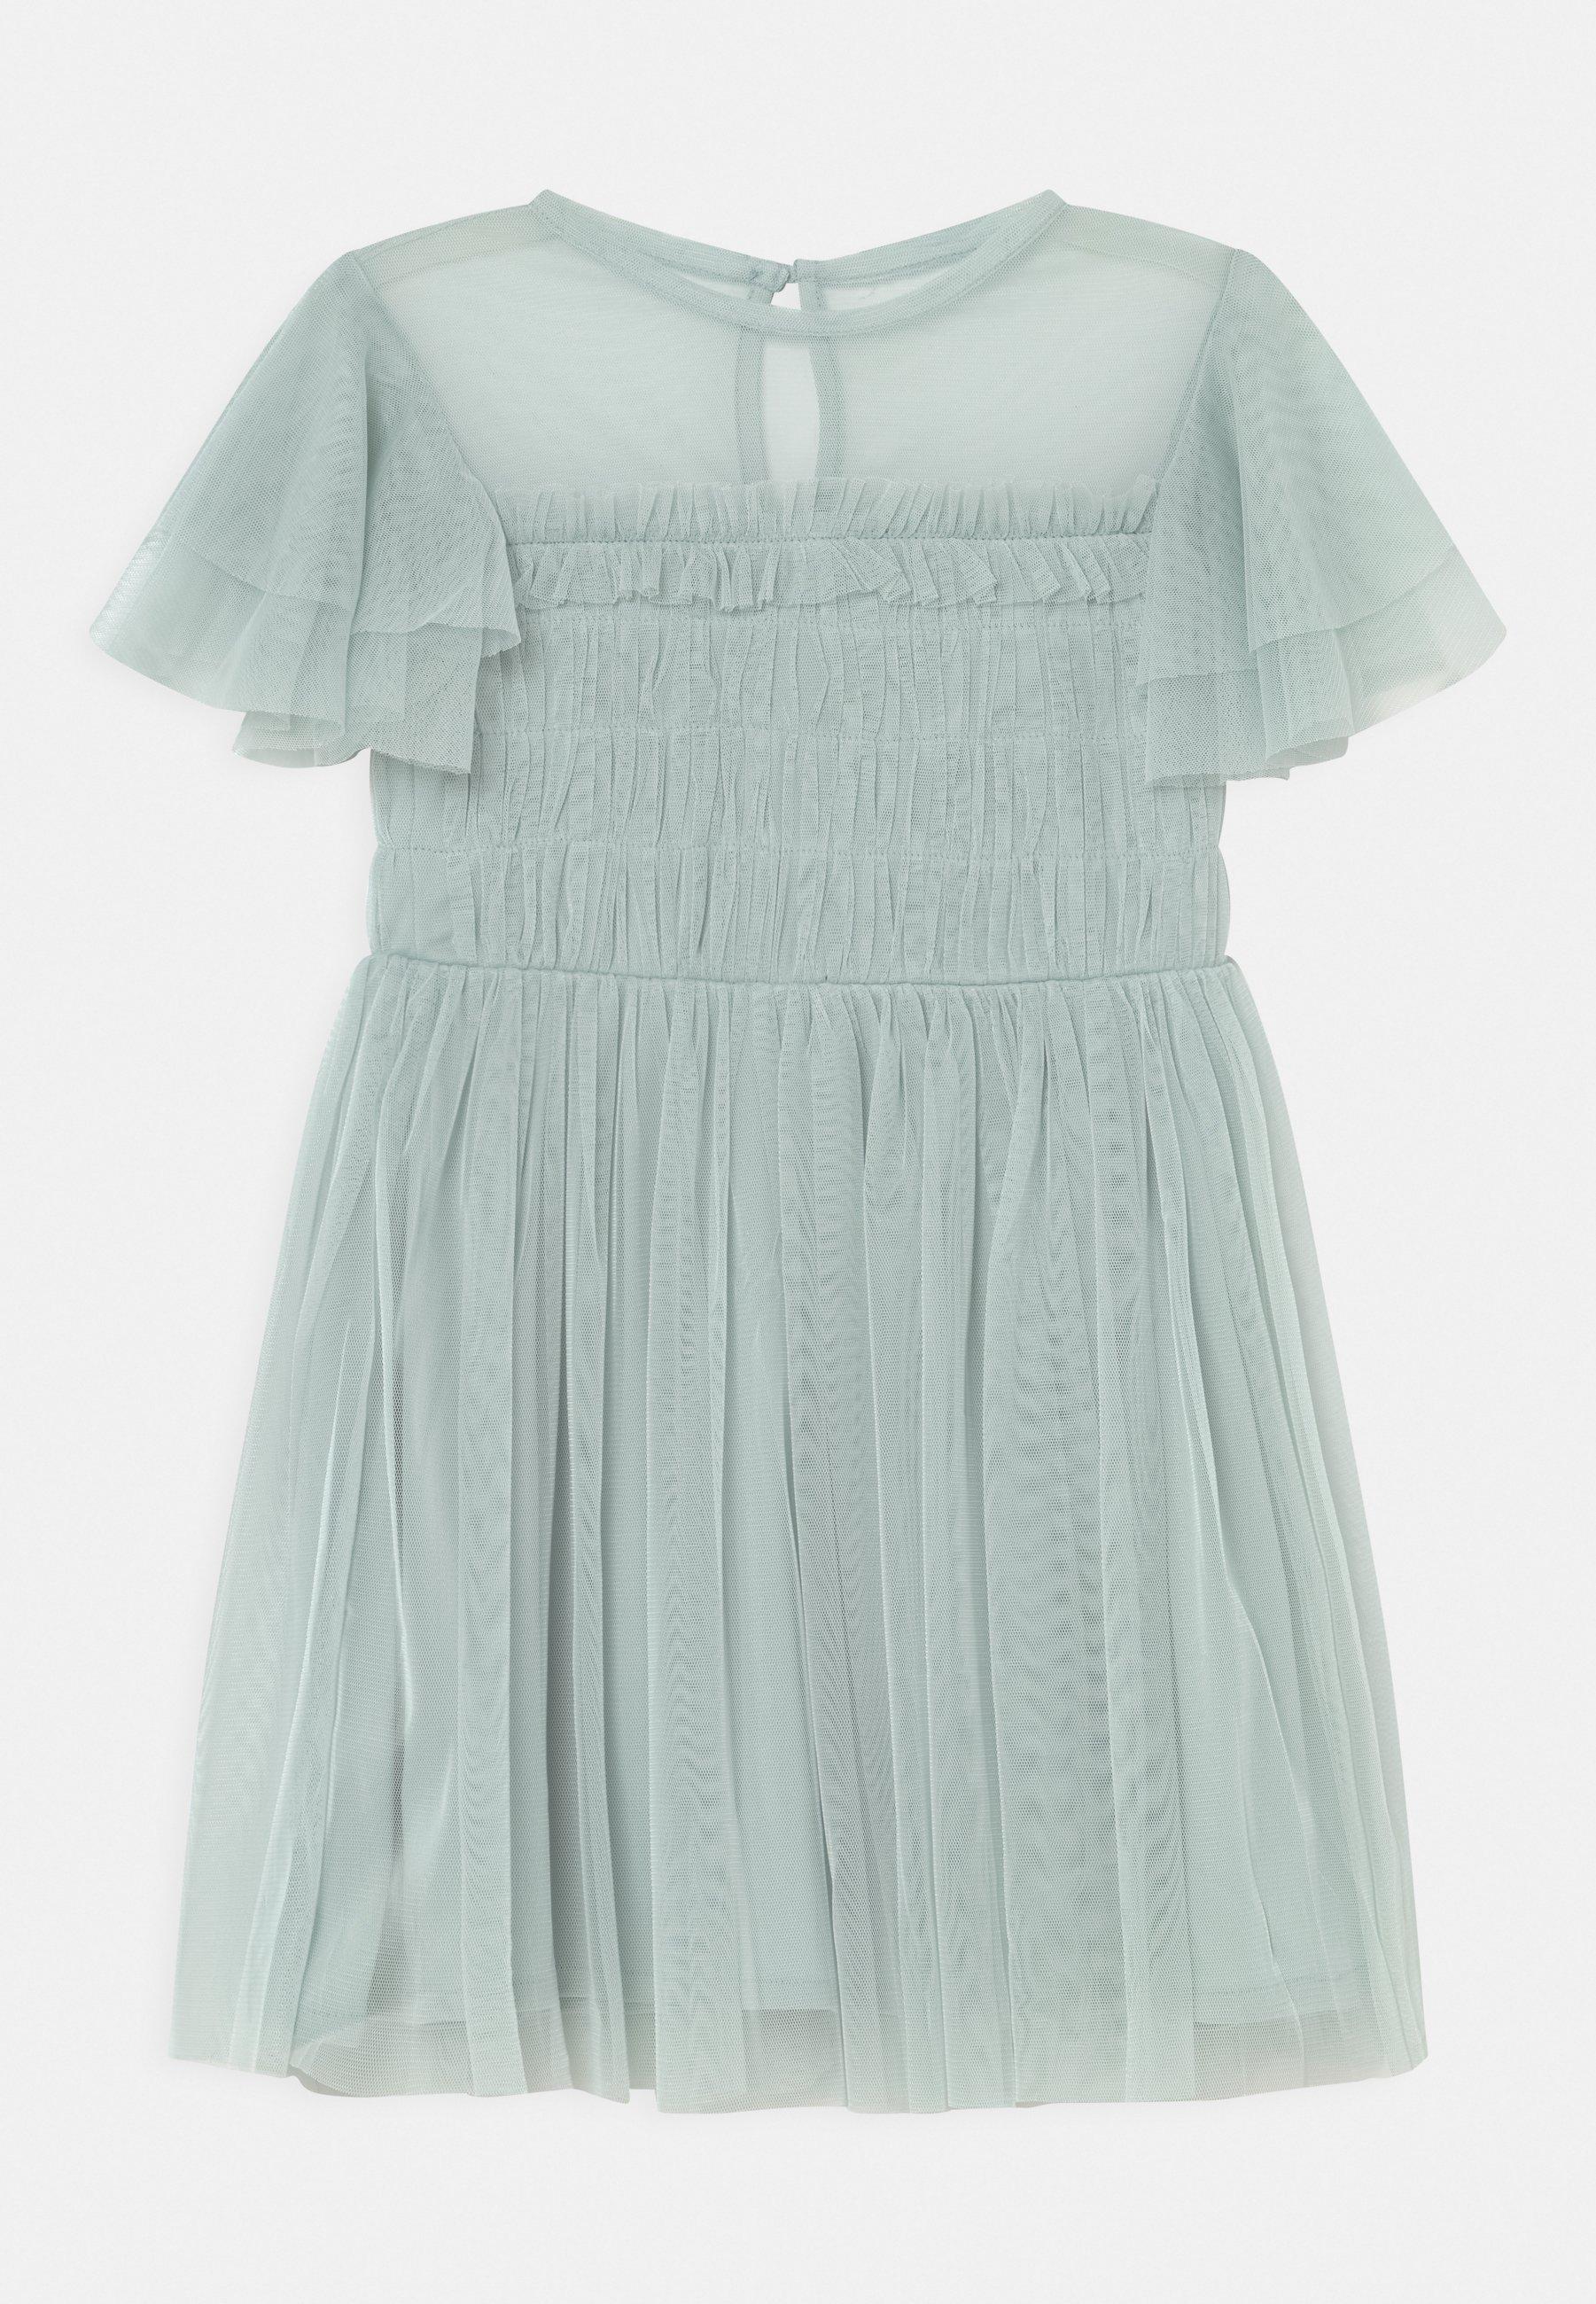 Enfant GATHERED BODICE RUFFLE DRESS - Robe de soirée